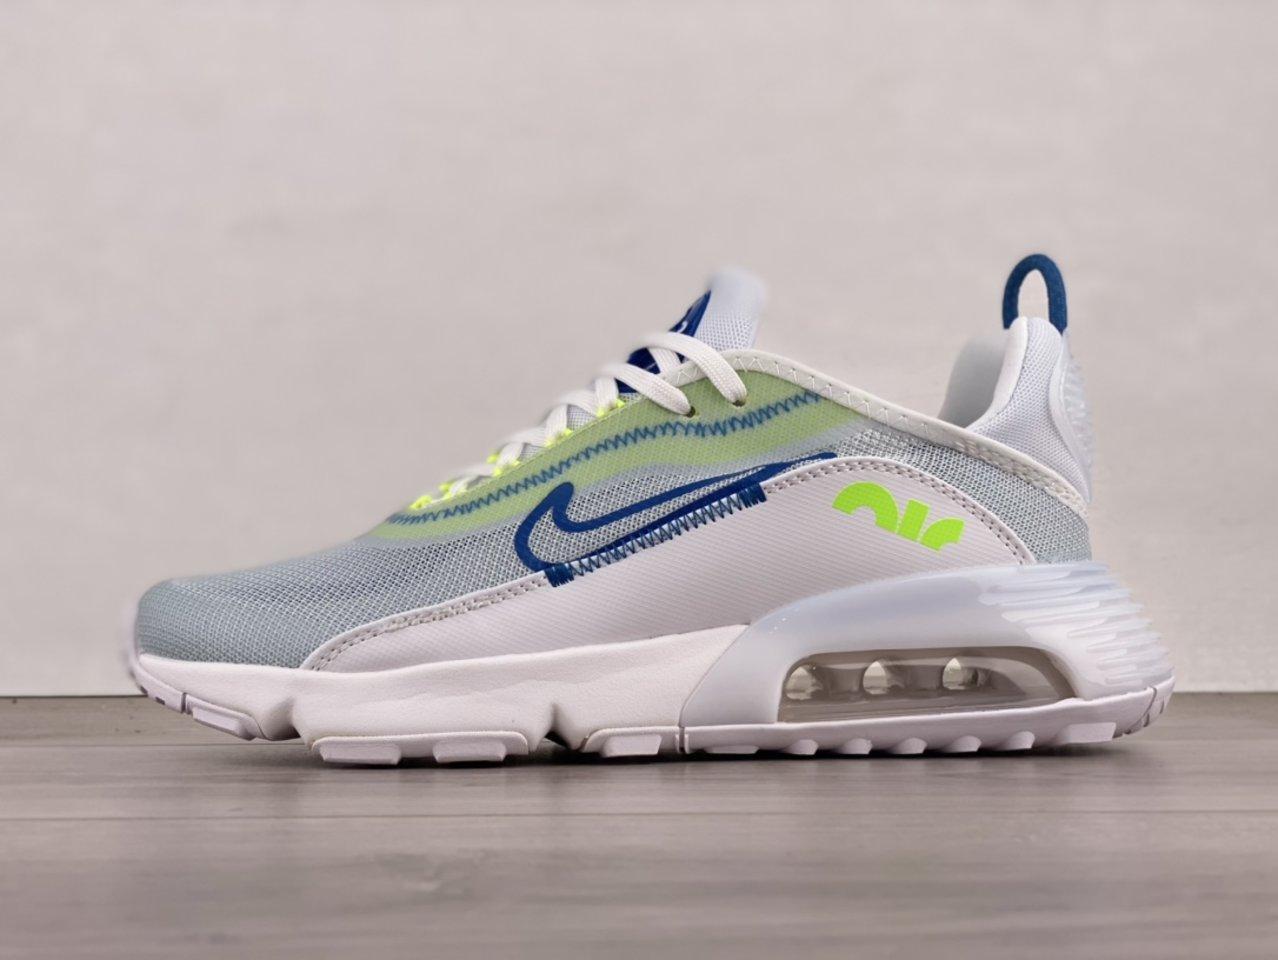 Nike Air Max 2090 Platinum Tint Running Shoe CZ1708-002